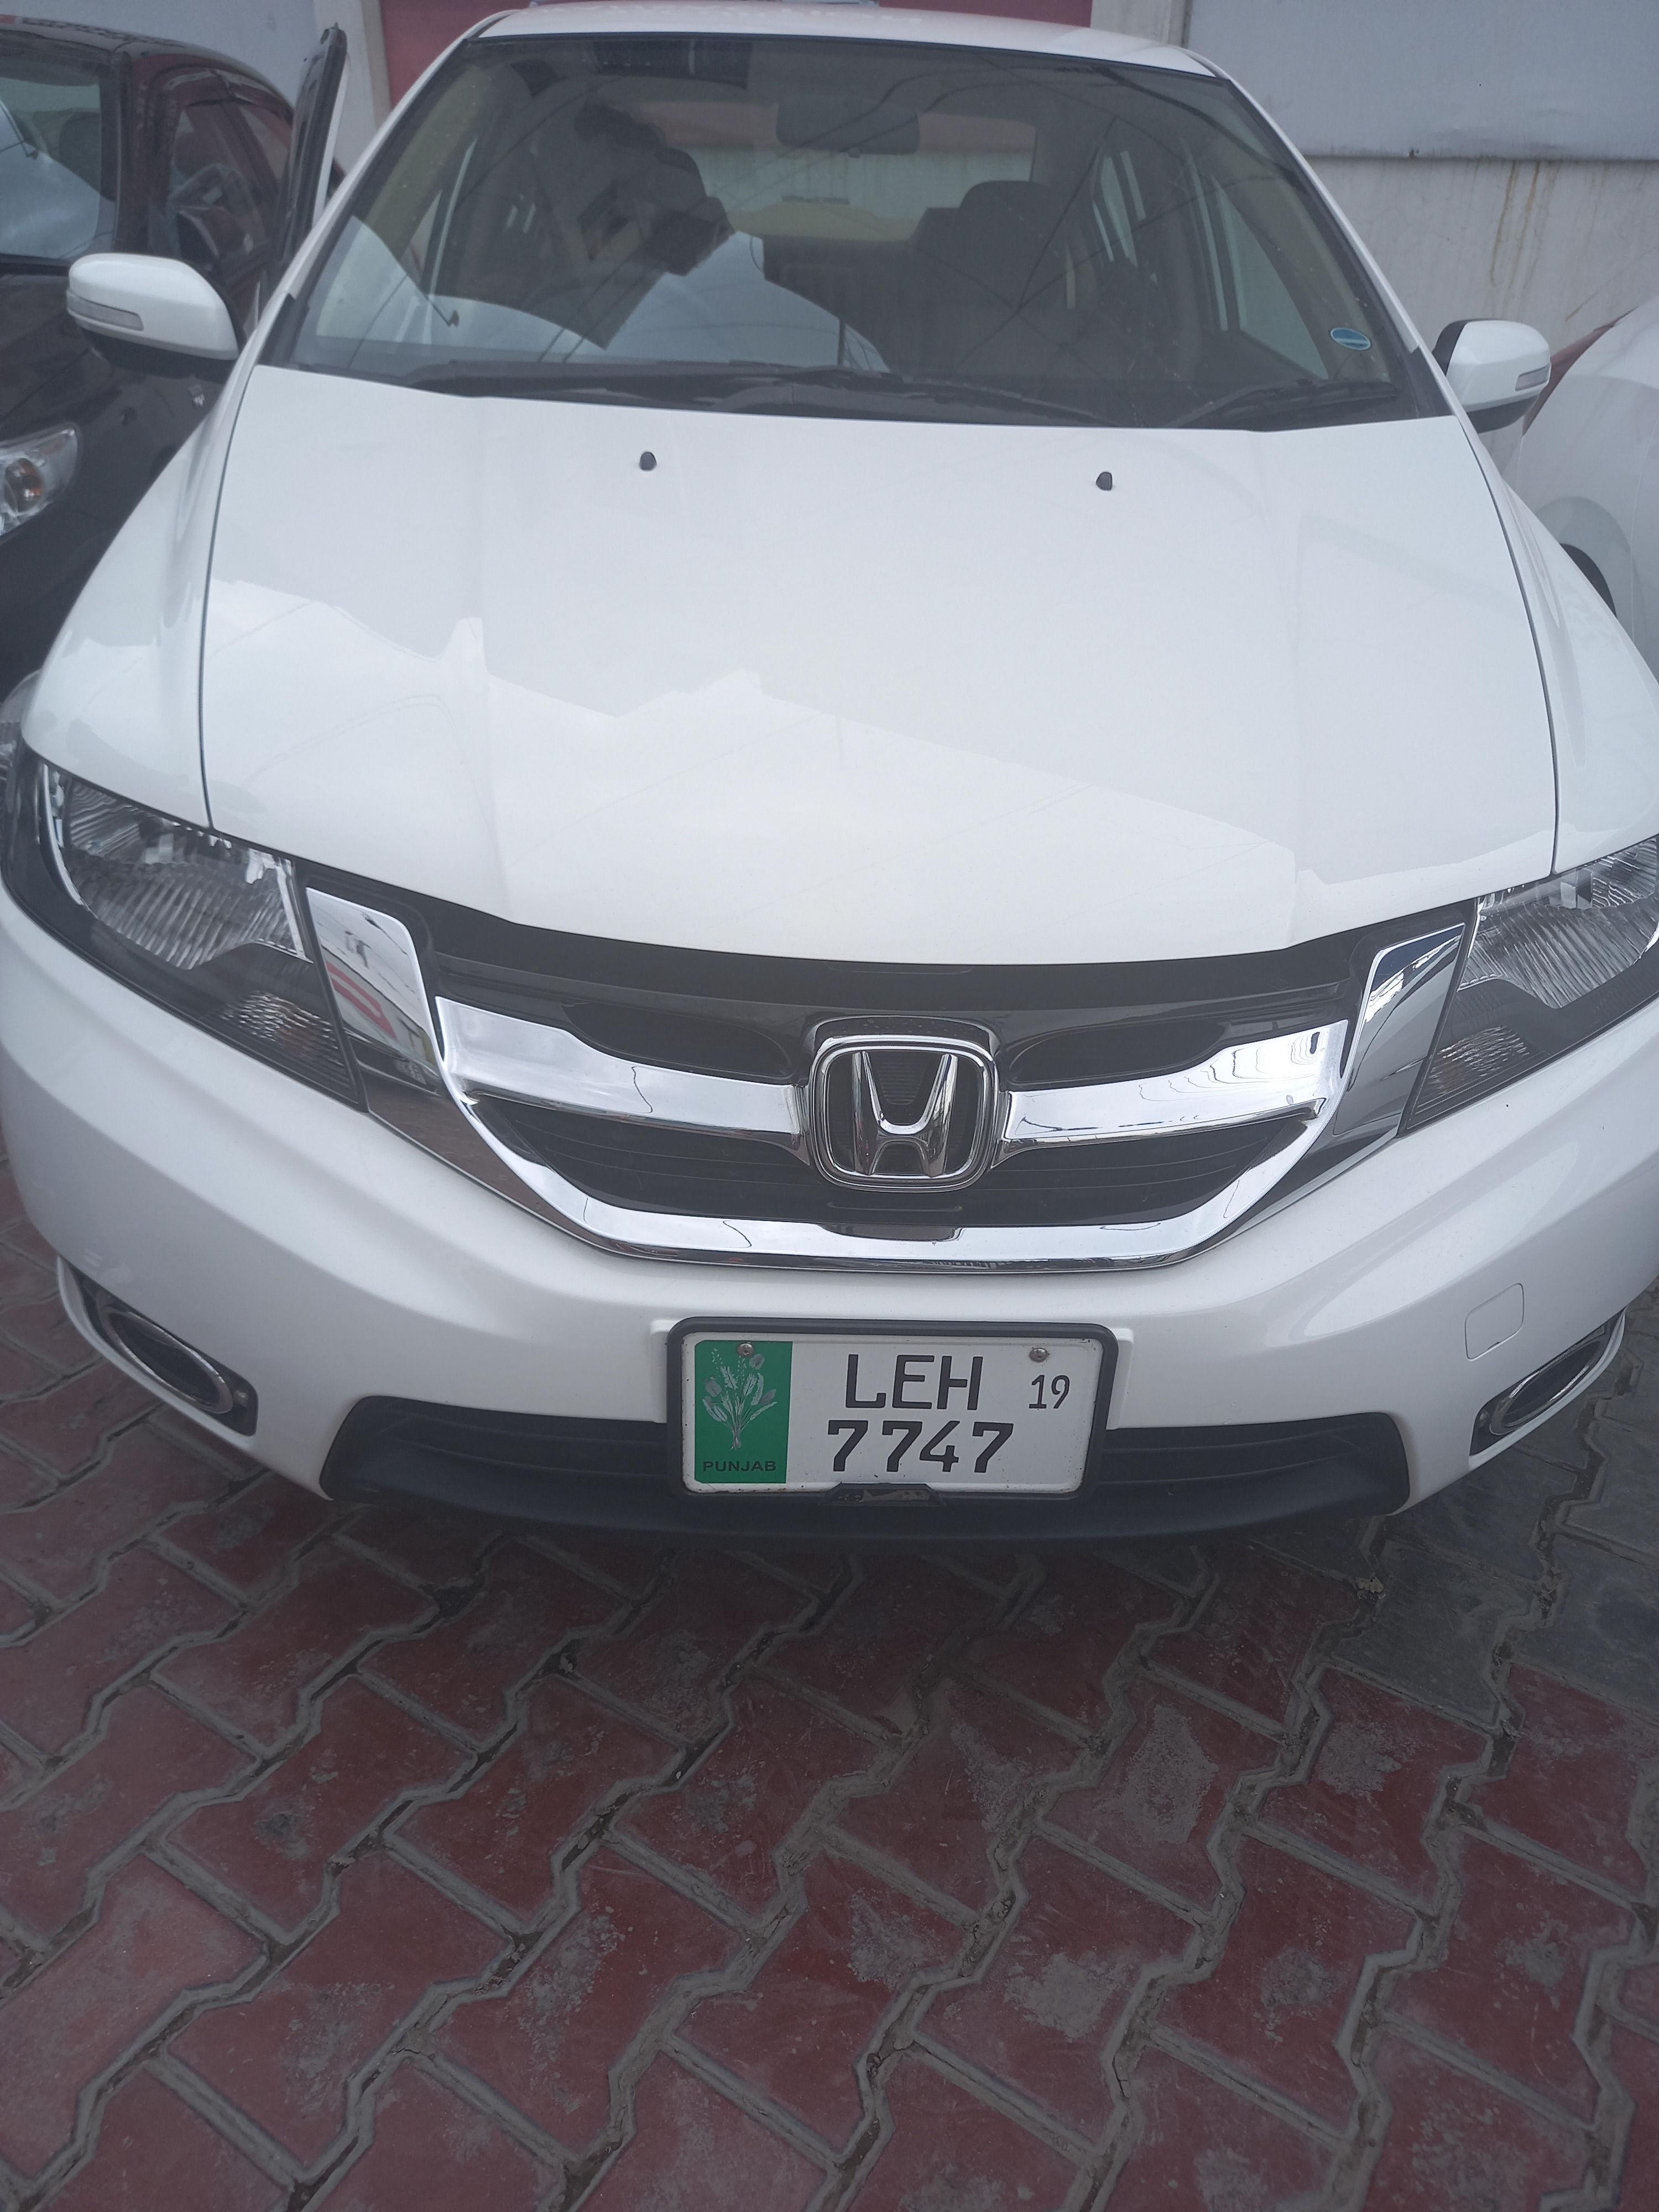 Honda City Aspire 1.5 i-VTEC Prosmatec